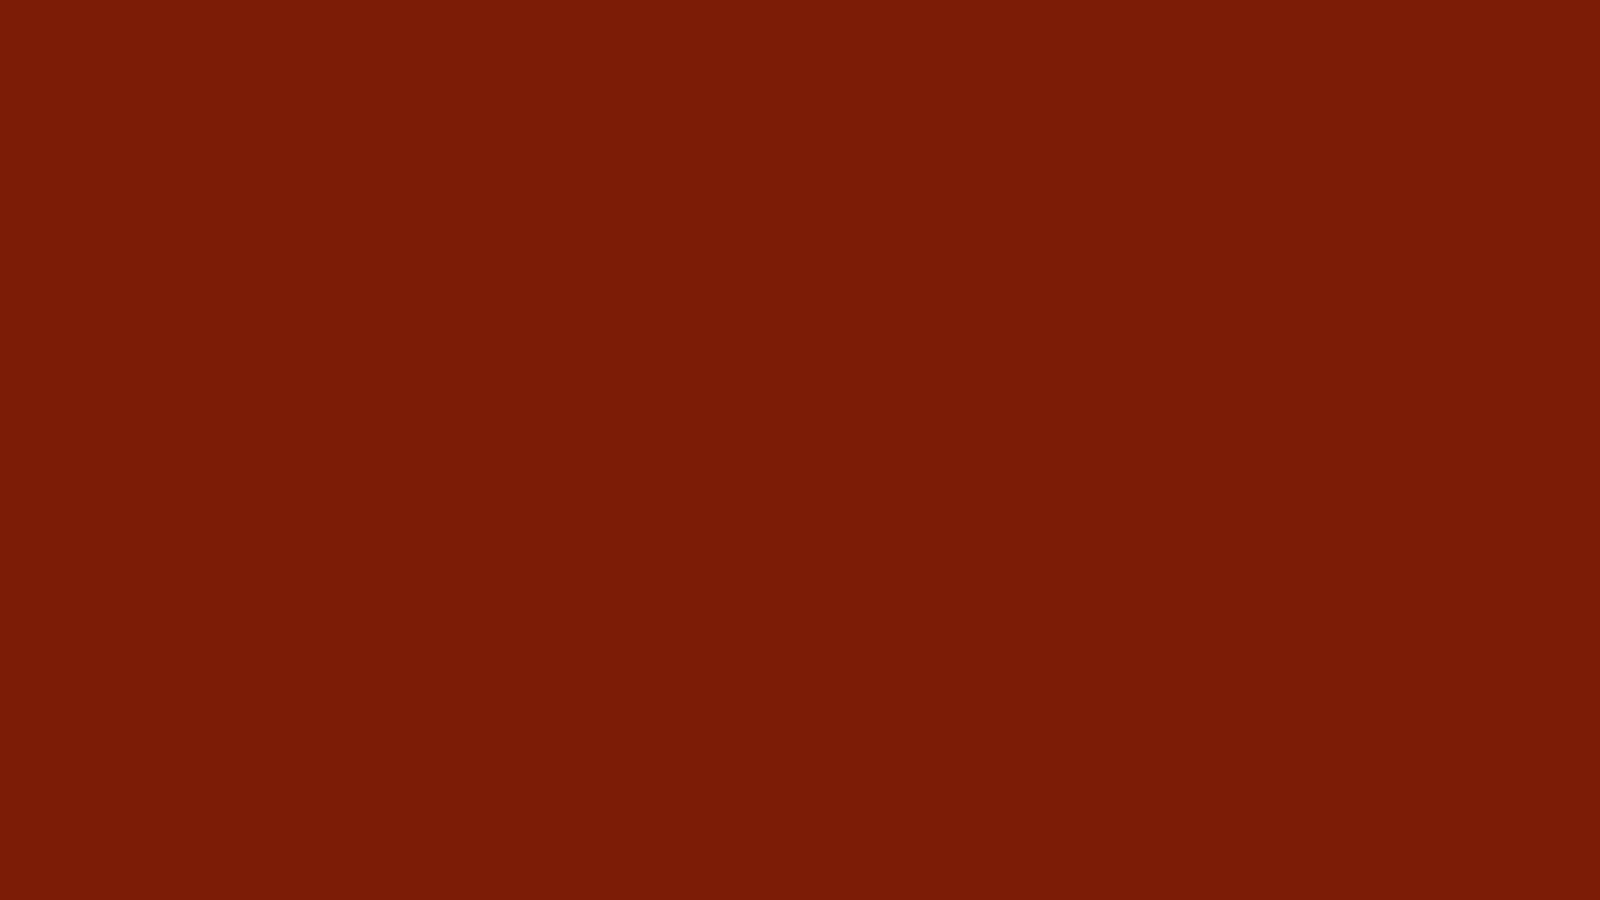 1600x900 Kenyan Copper Solid Color Background